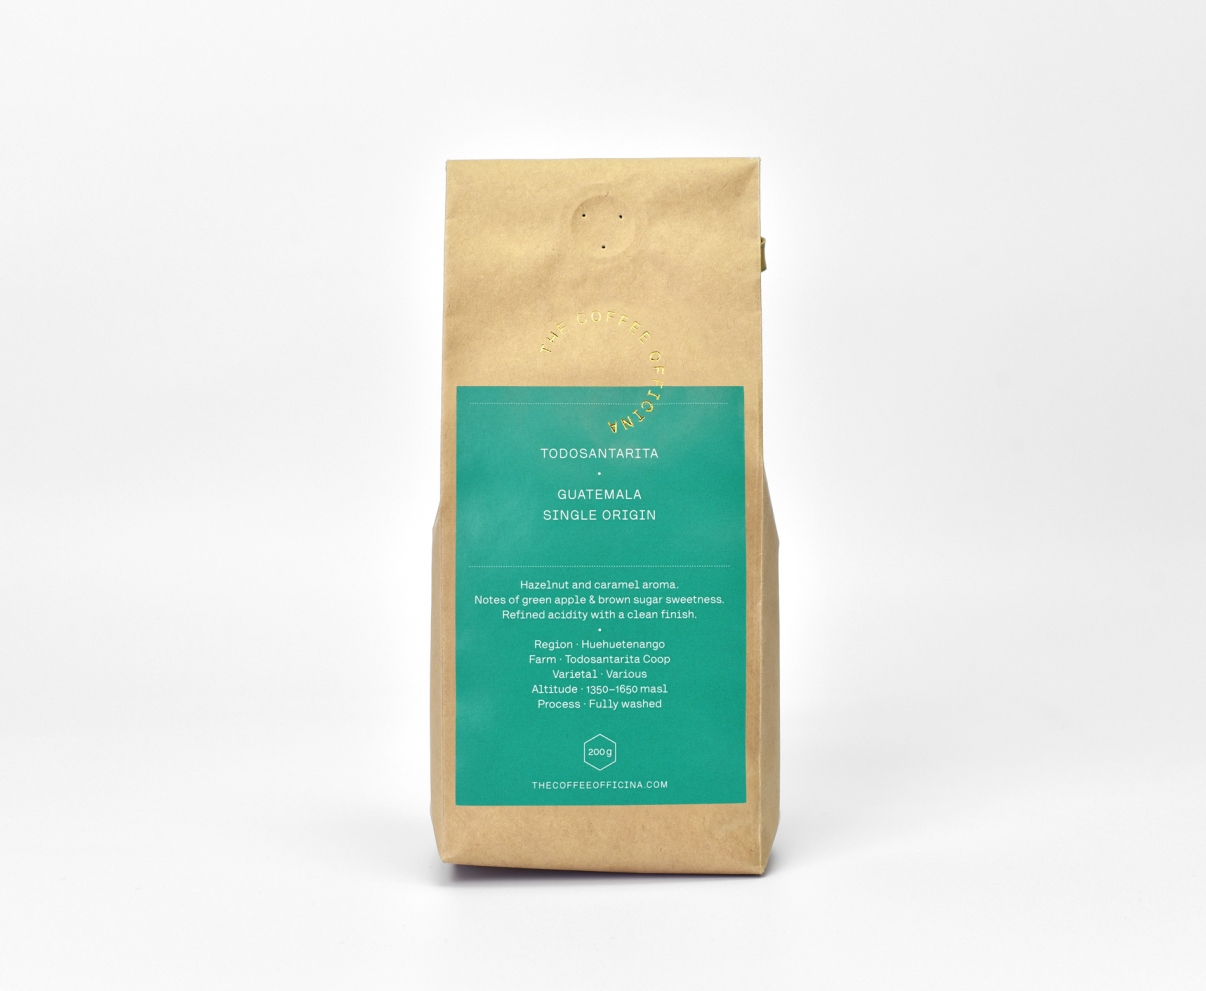 The Coffee Officina Guatemala Todosantarita Single Origin